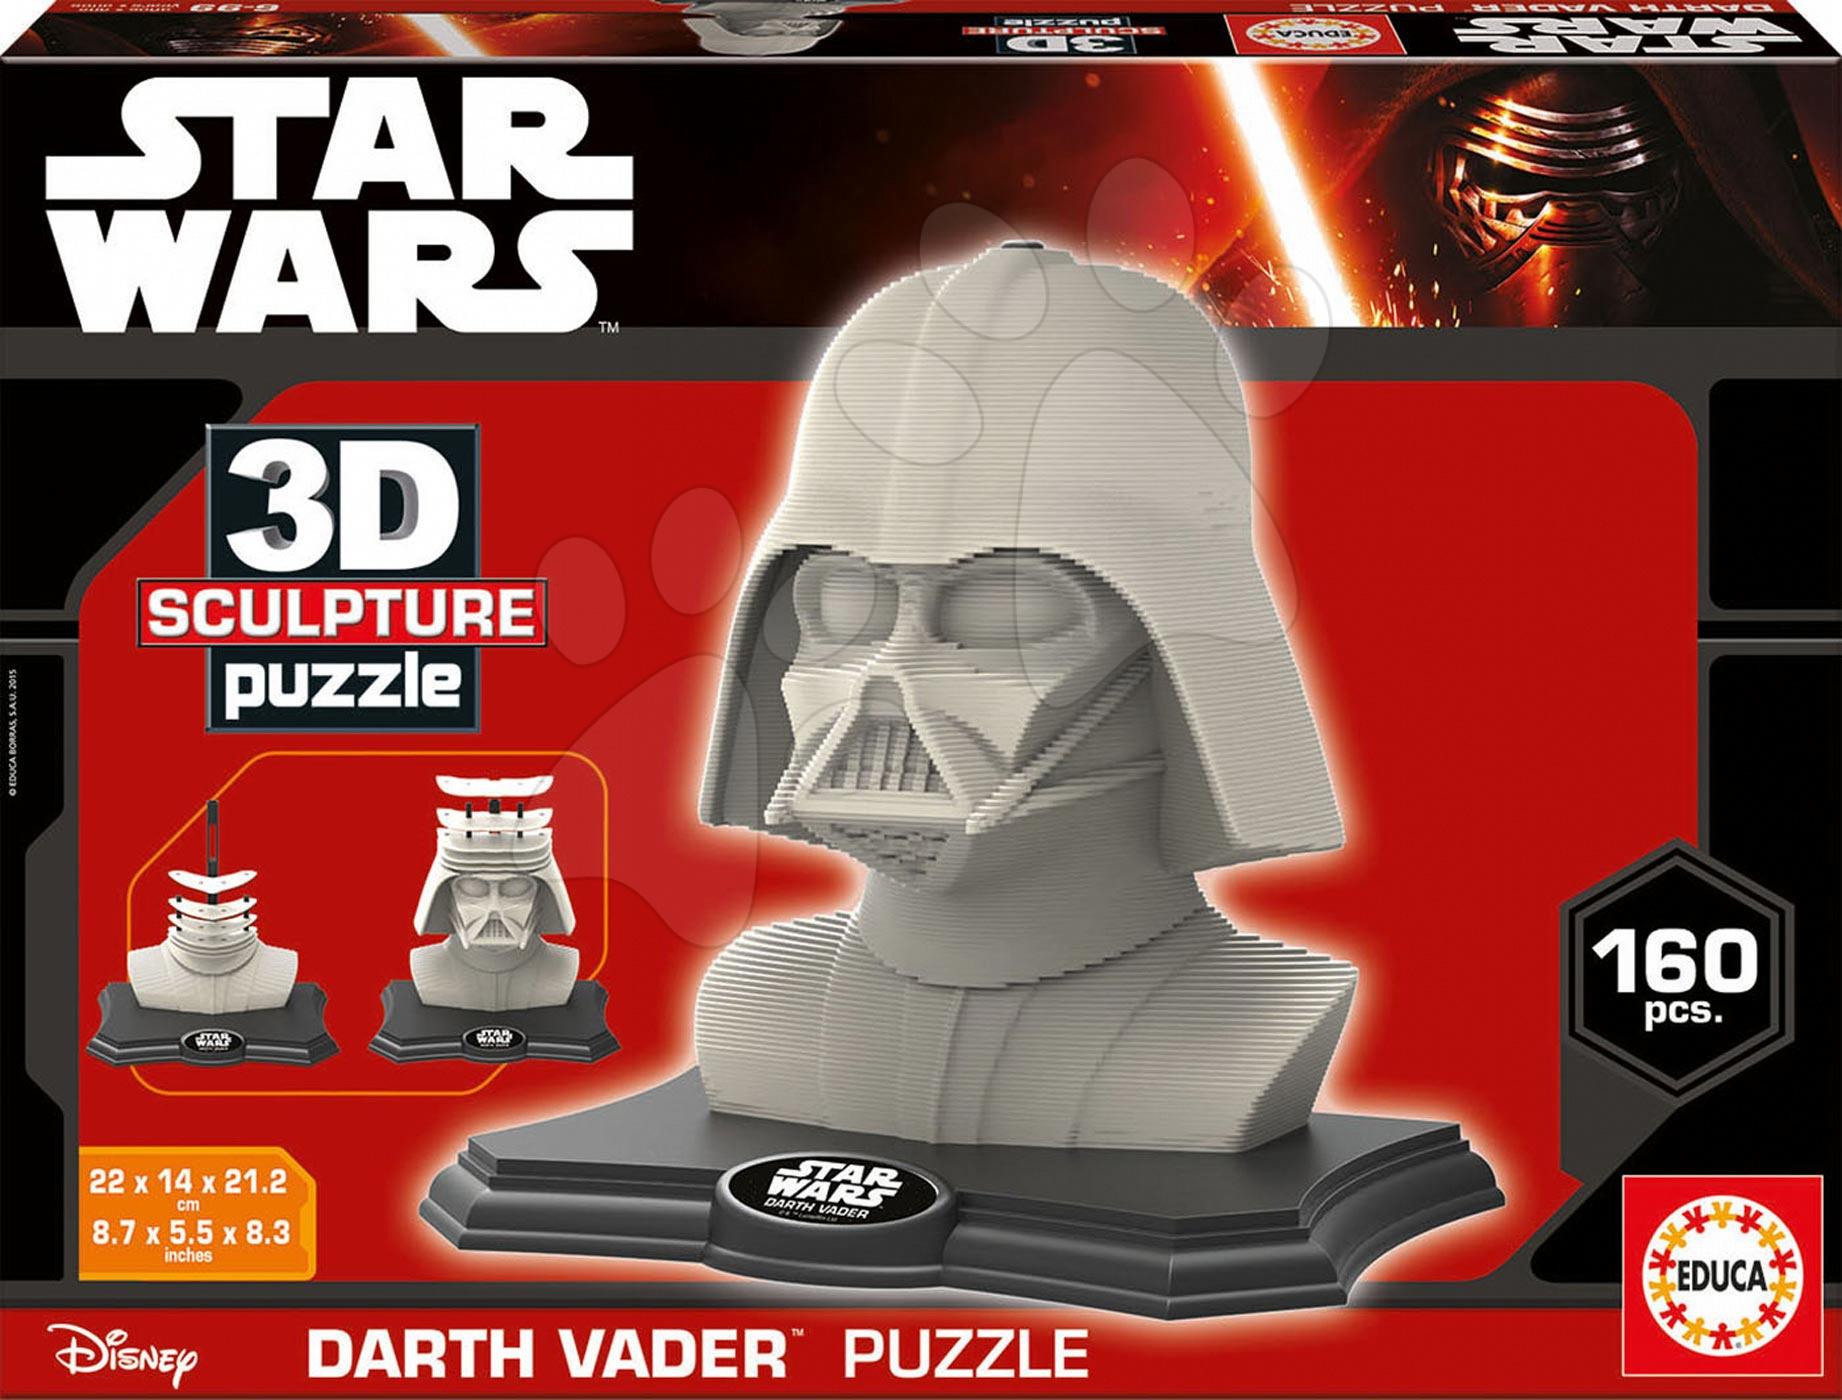 Puzzle 3D - Puzzle 3D Sculpture Hviezdne vojny Darth Vader Educa 160 dielov od 6 rokov